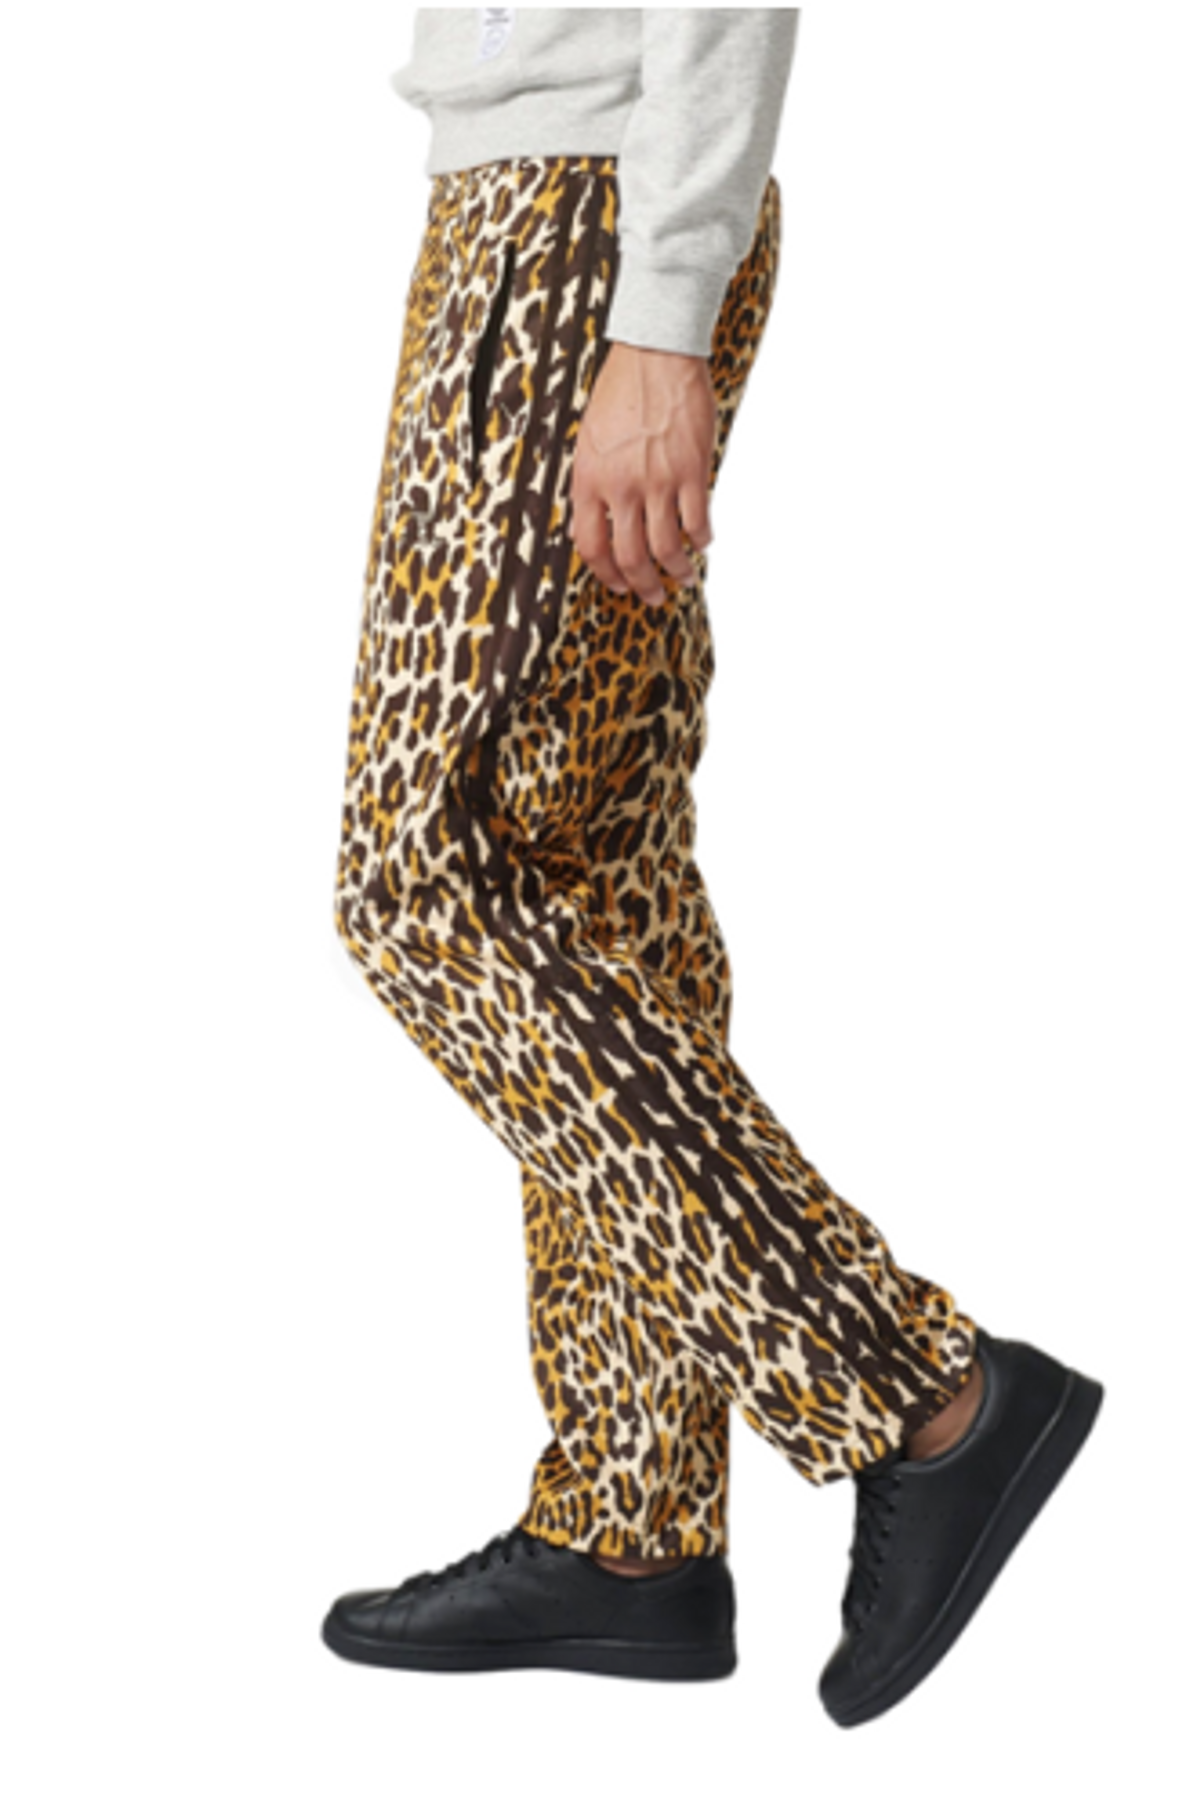 Adidas × Jeremy Scott Jeremy Scott X Adidas Leopard Tracksuit Pants Size 30 $113